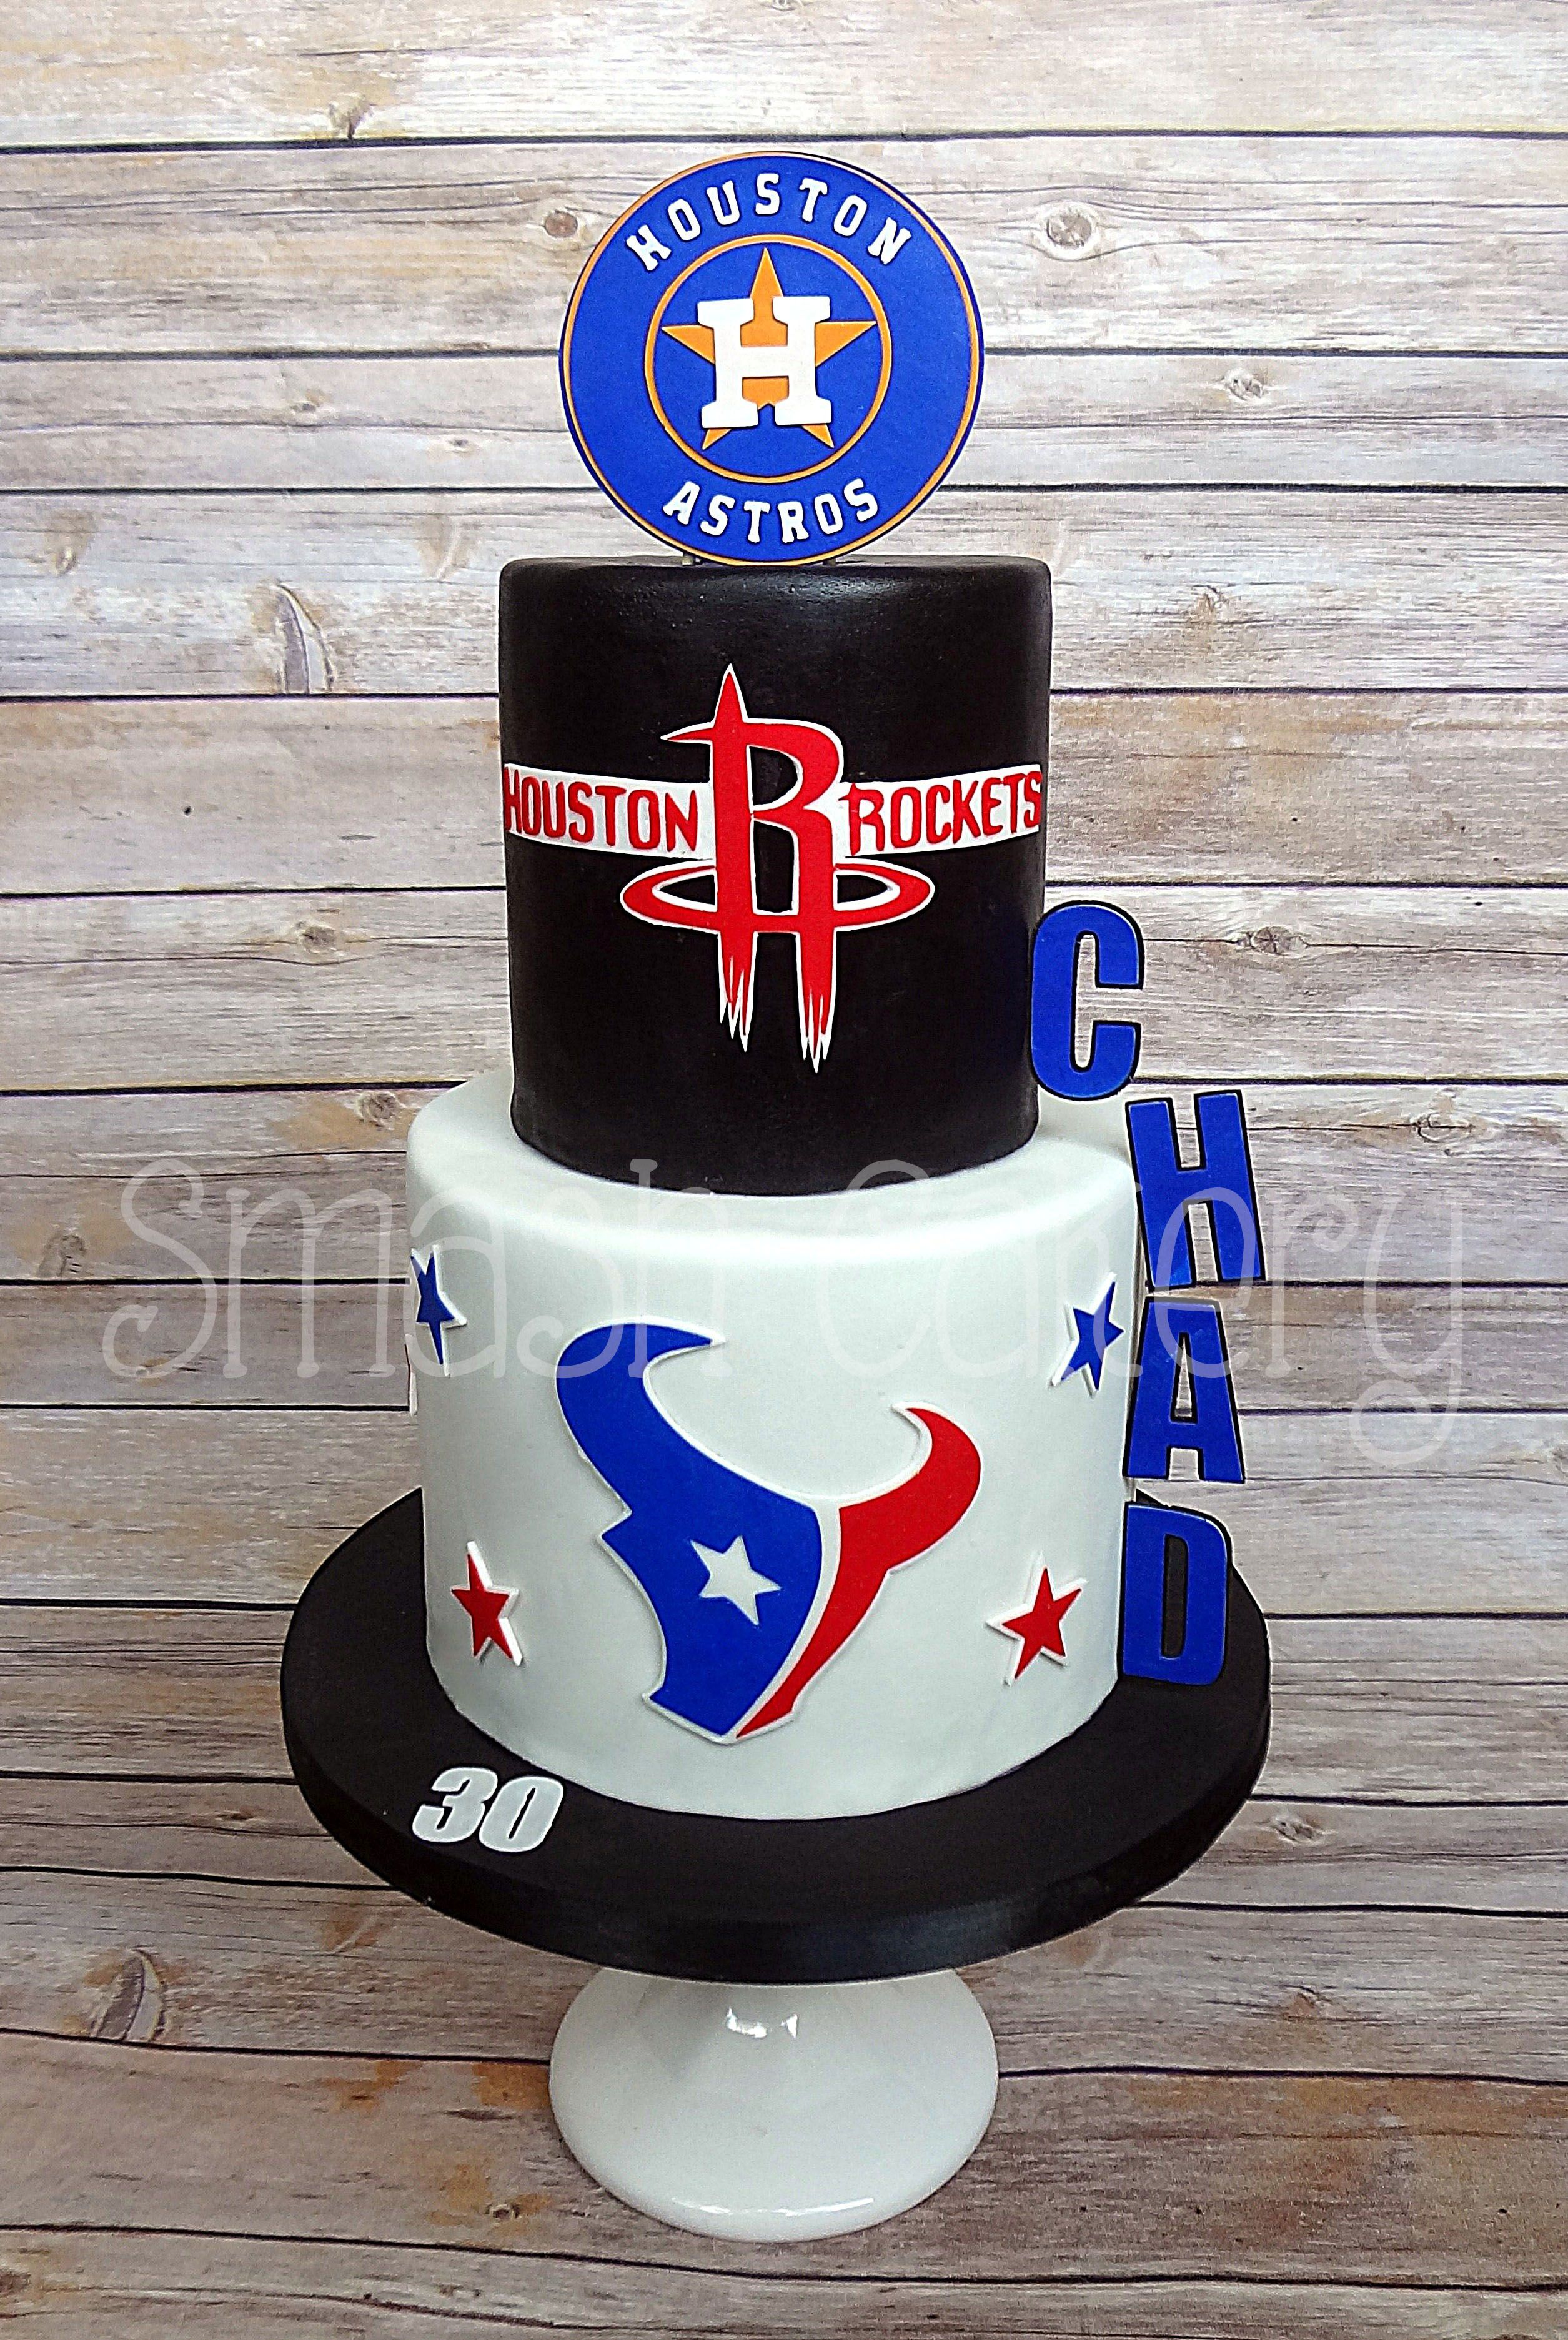 Houston Texans Rockets Astros Birthday Cakes